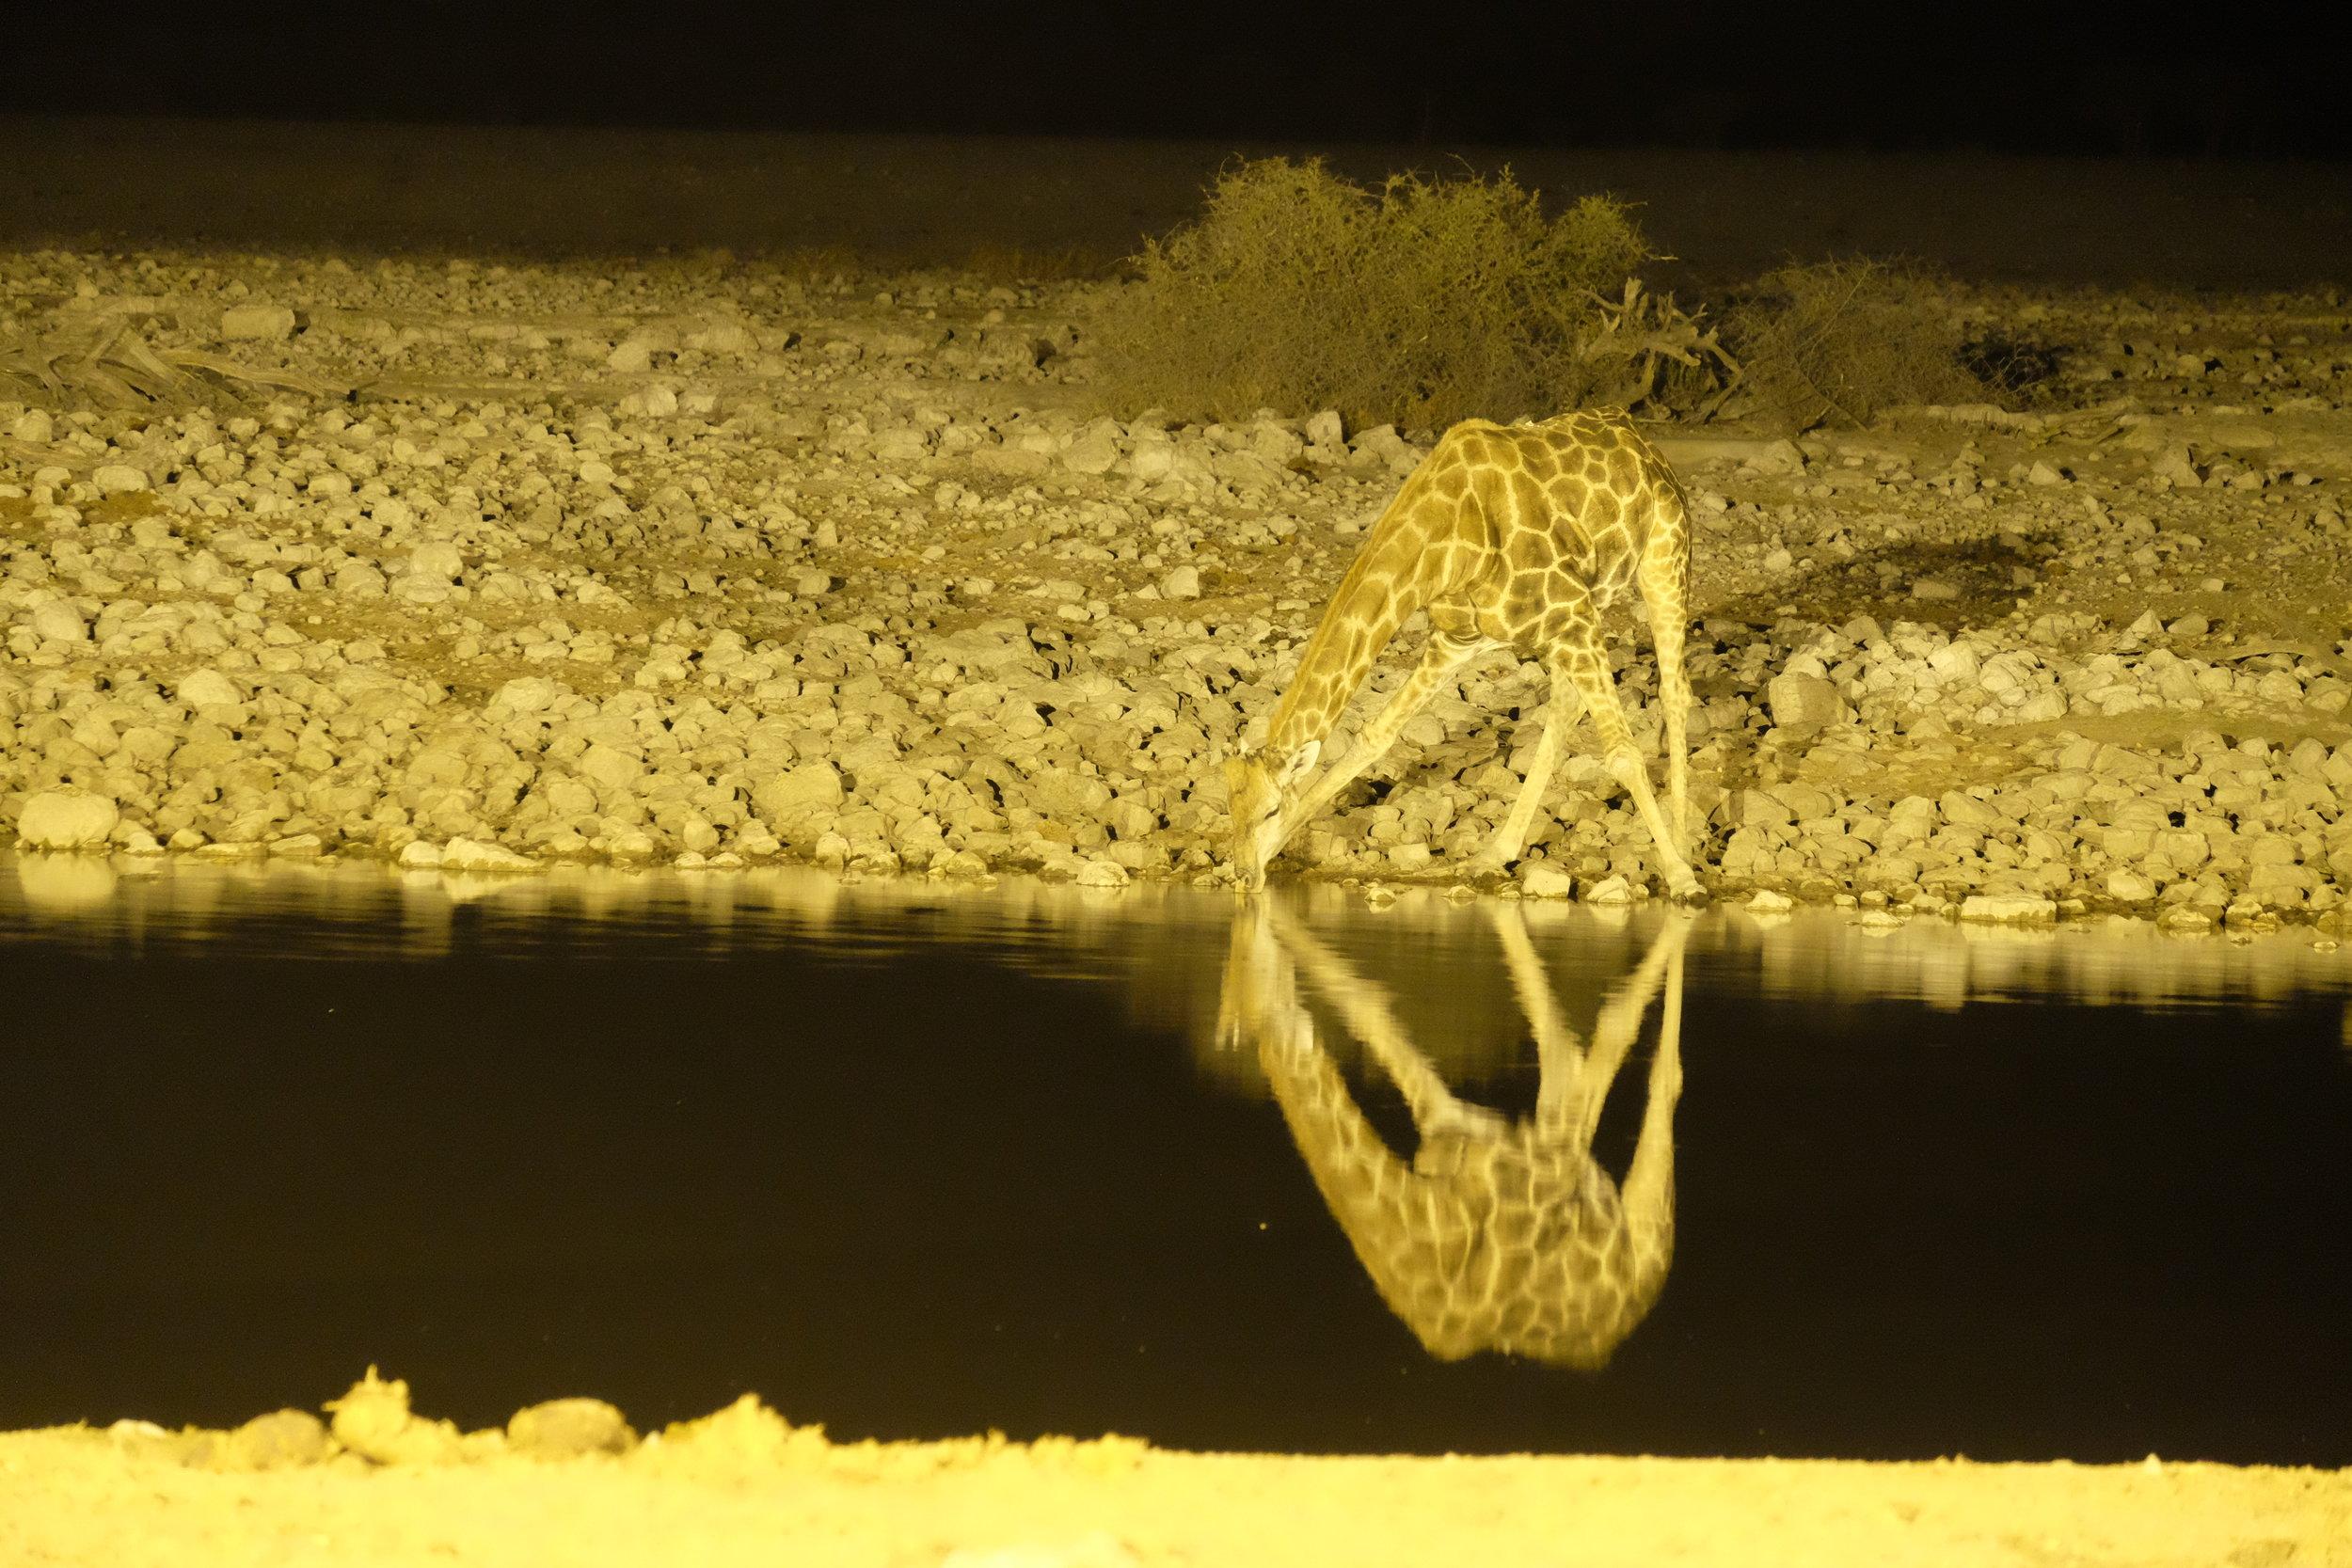 Water hole at Okaukuejo (Etosha)